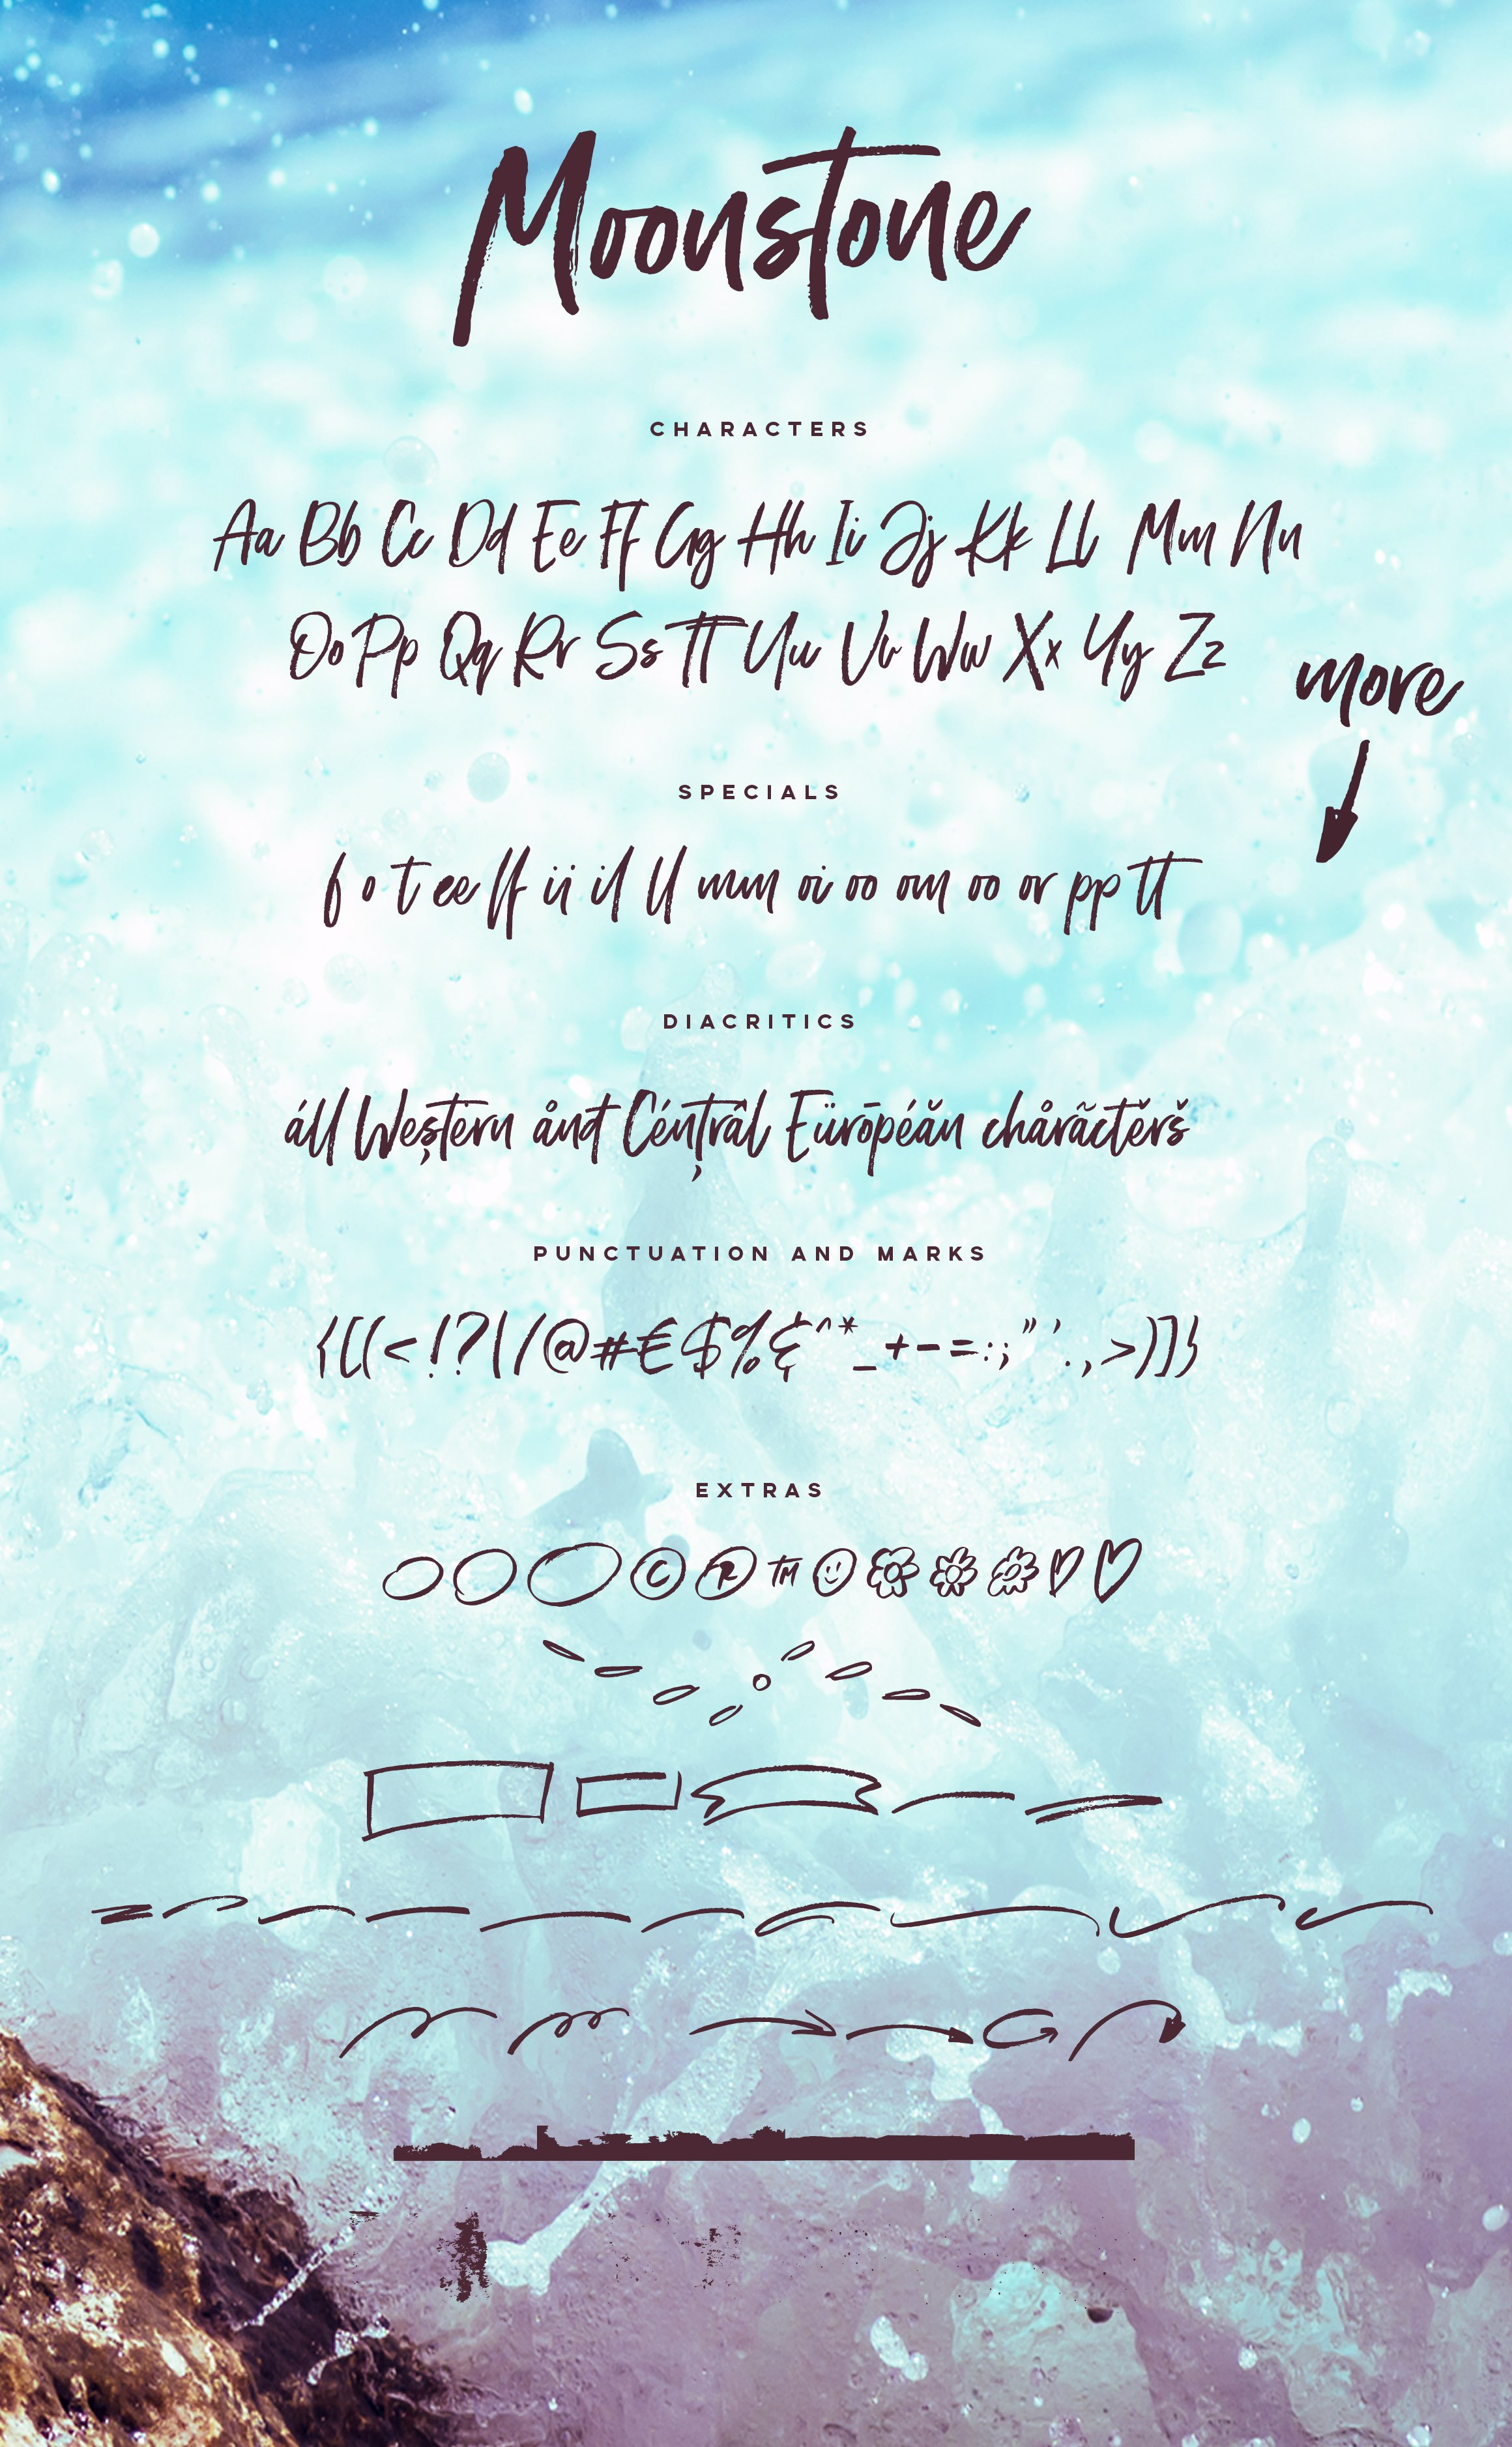 Moonstone Brush Font Script Fonts Creative Market Pro